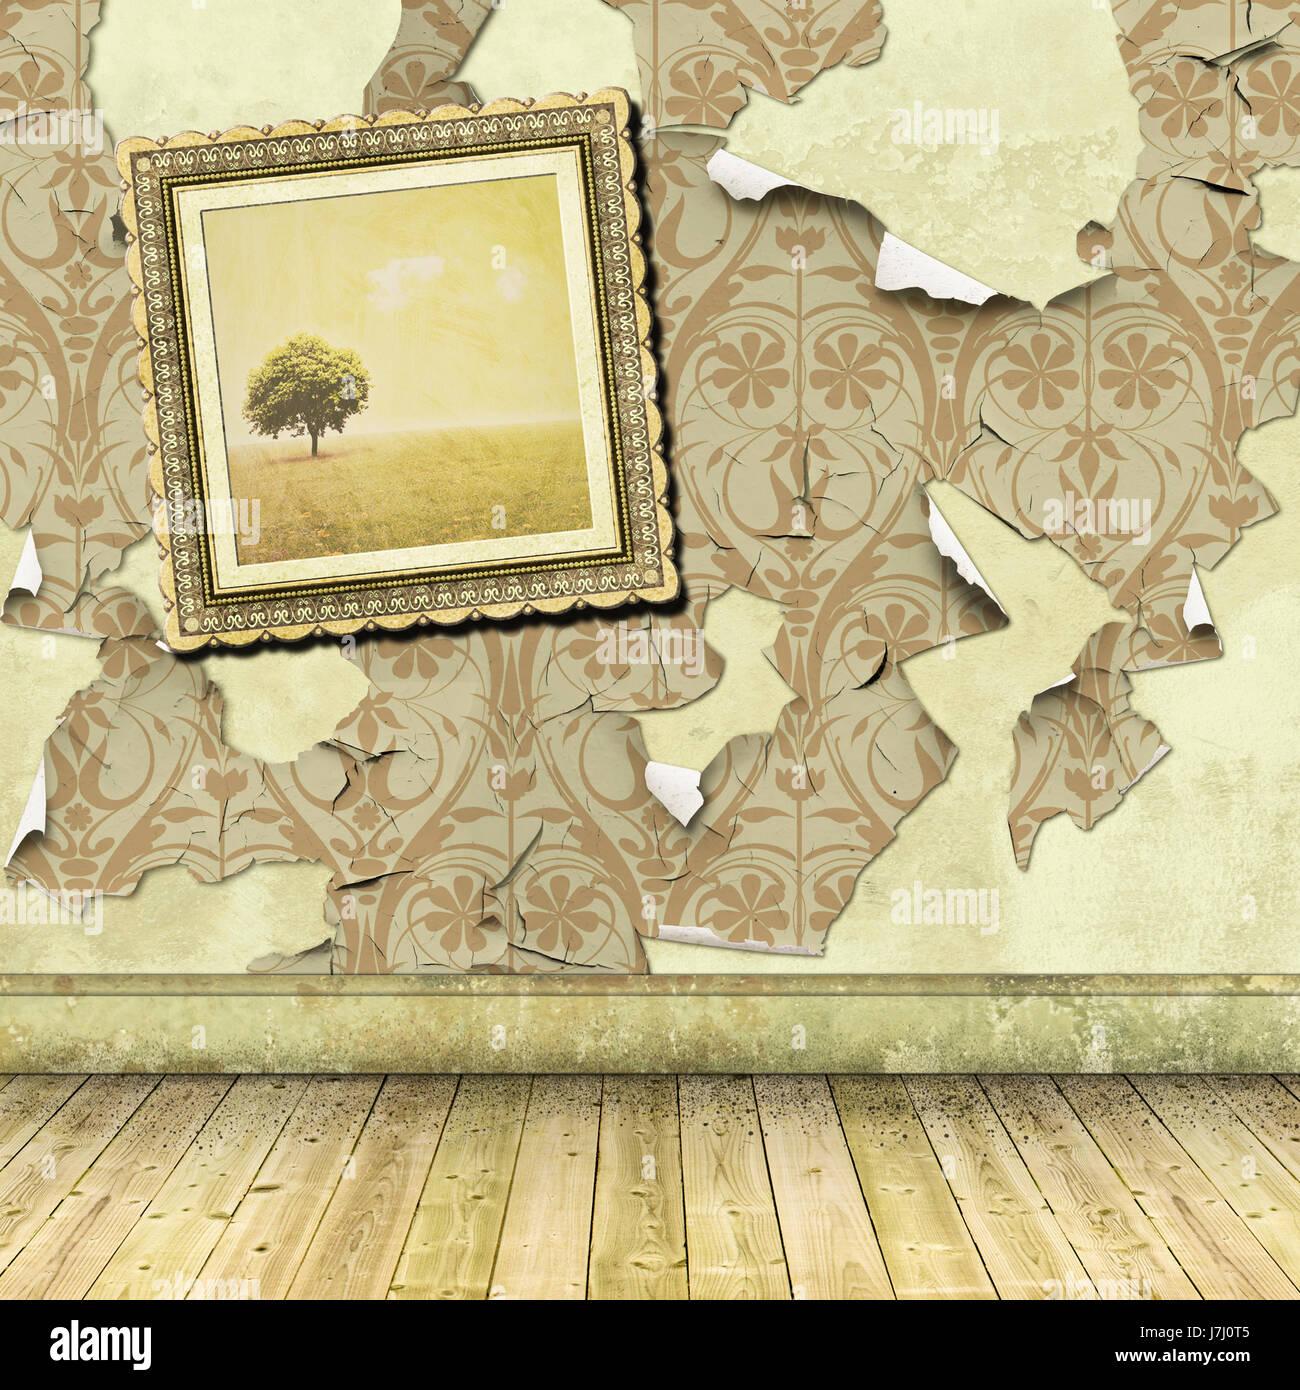 Wand Tapeten Zerrissen Peeling Zimmer Wand Zerfallen Schmutzige Getragene  Altertuemlich Veraltet